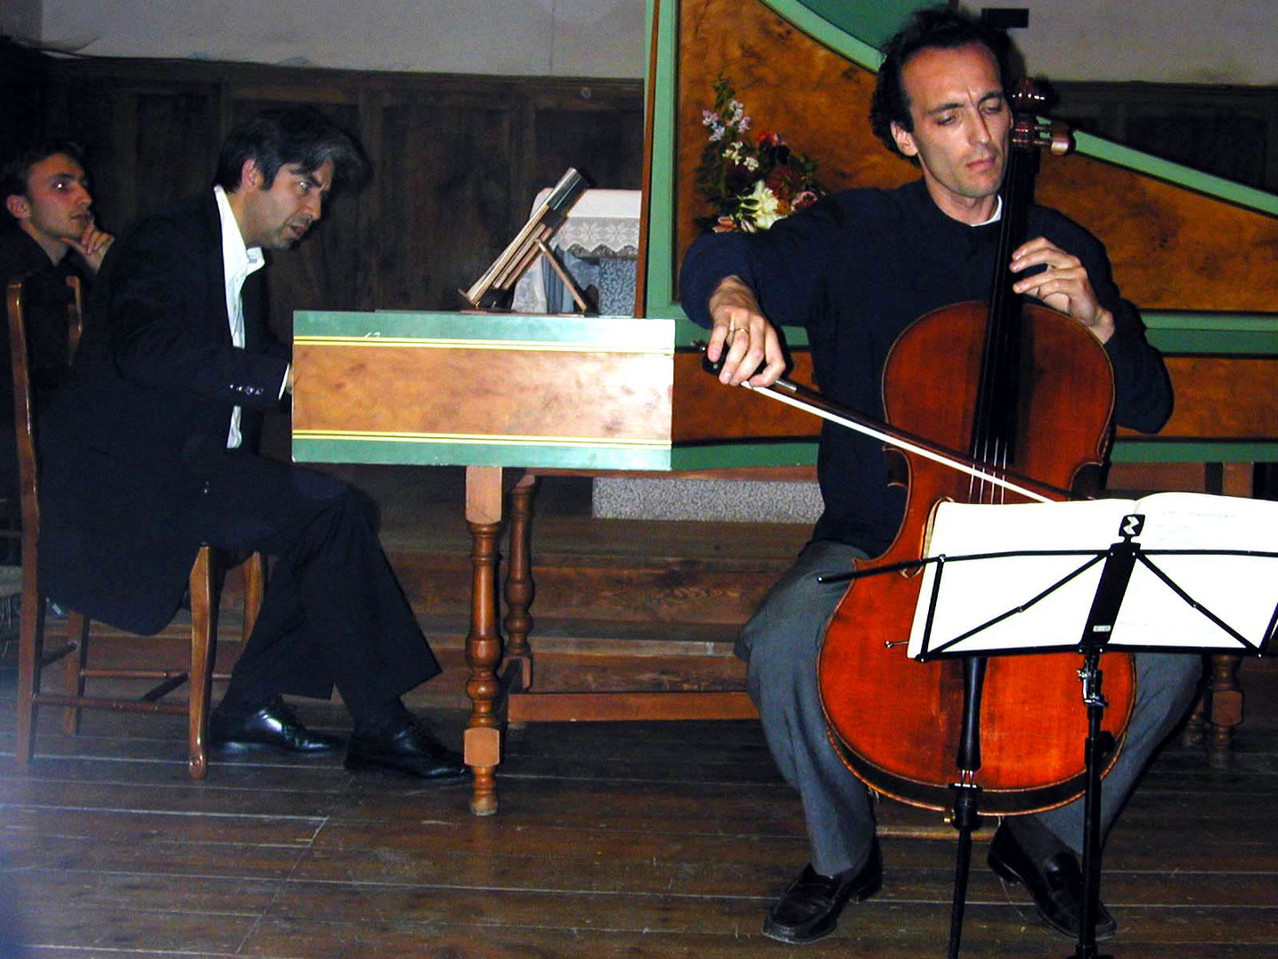 2004 : Stéphane Béchy et Christophe Beau